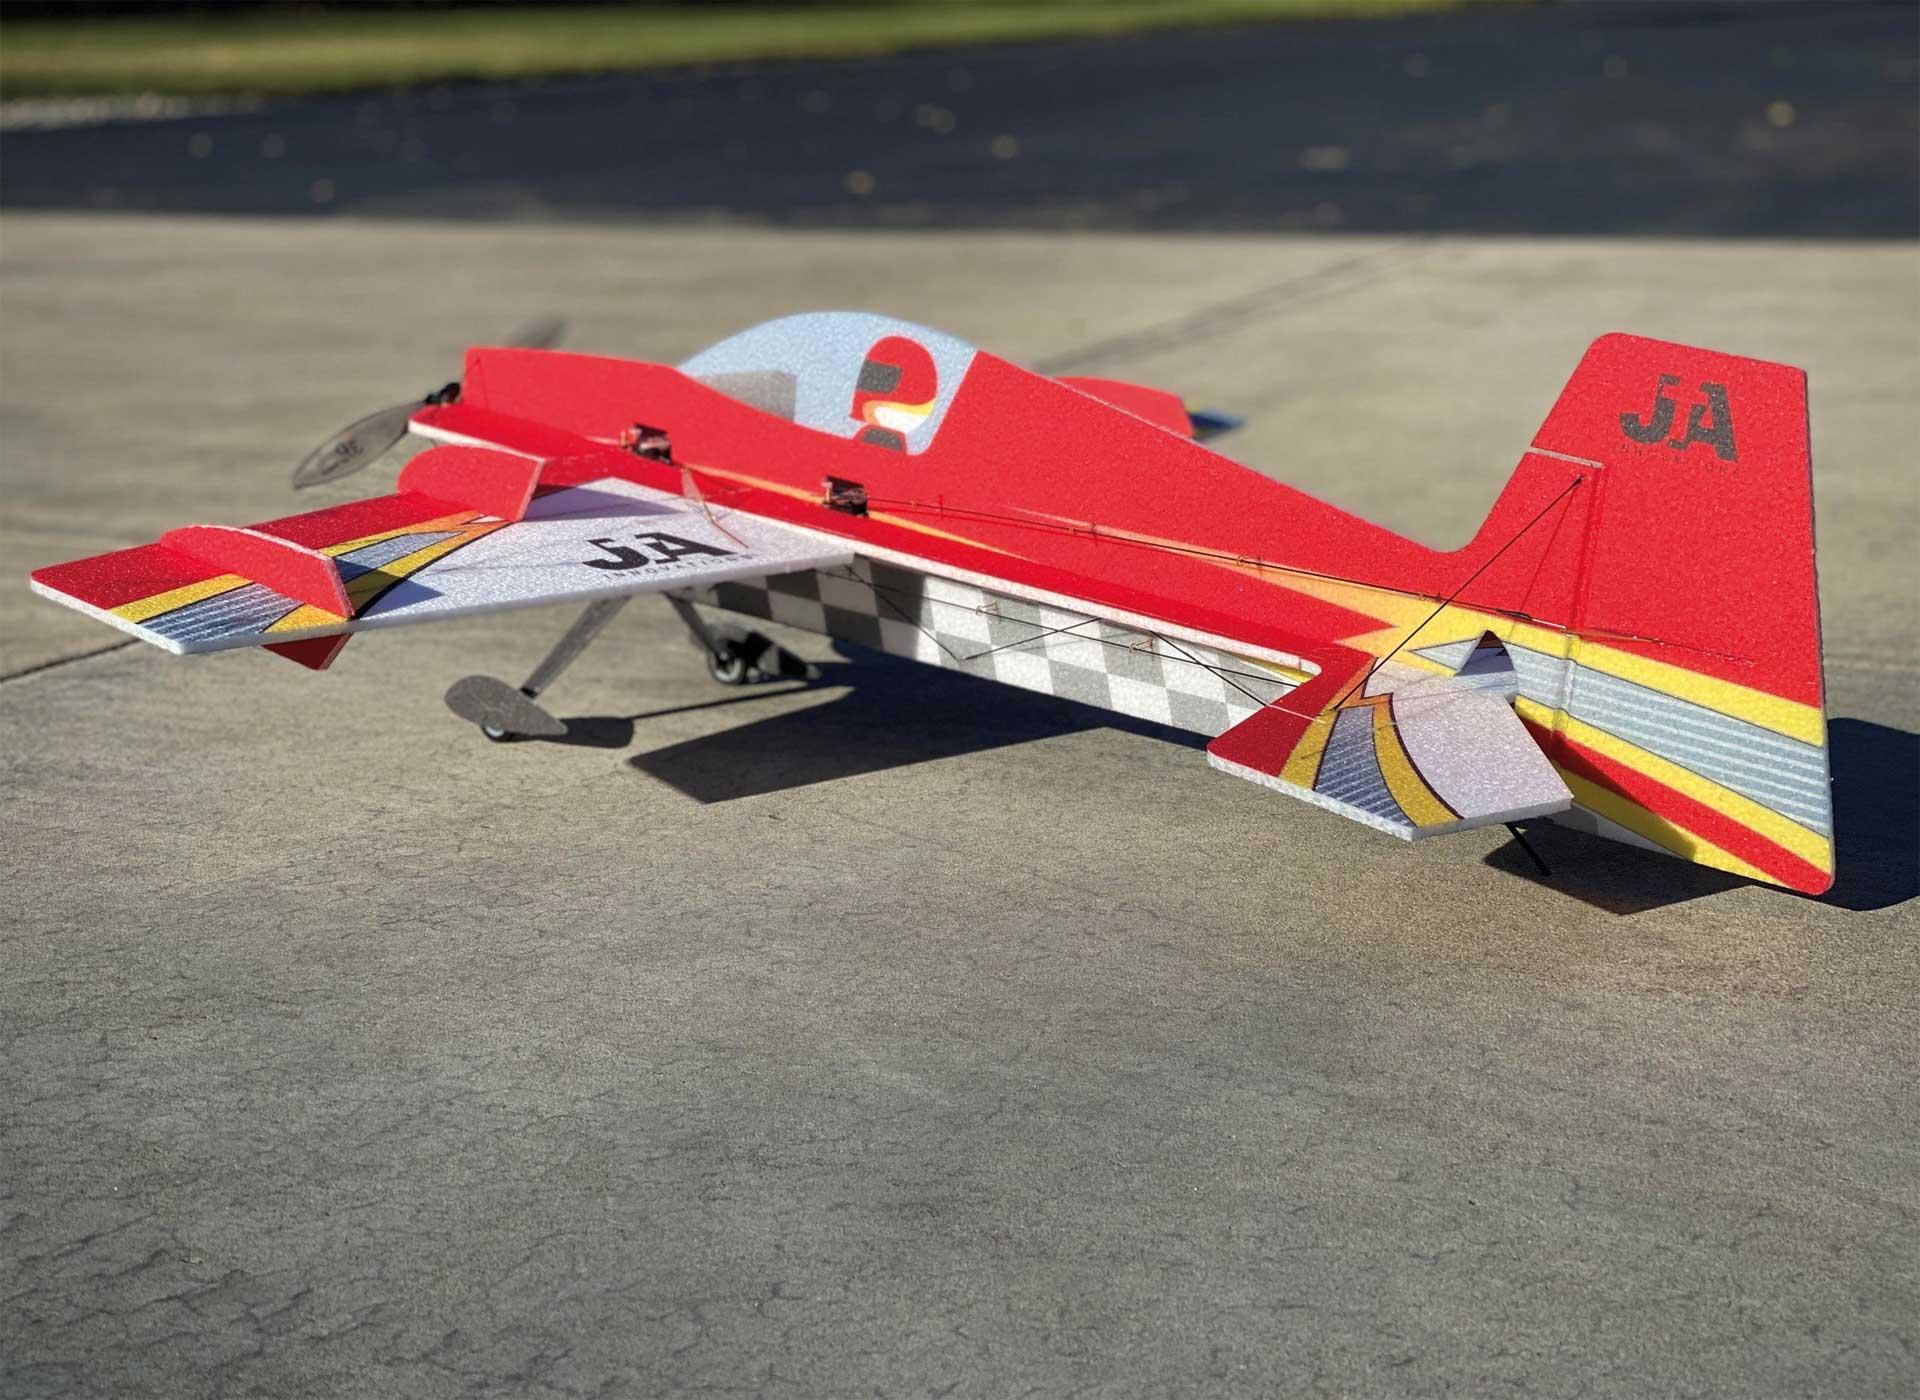 "JTA Innovations SLICK (RED /white) 33"" EPP 3D Aerobatics Model"